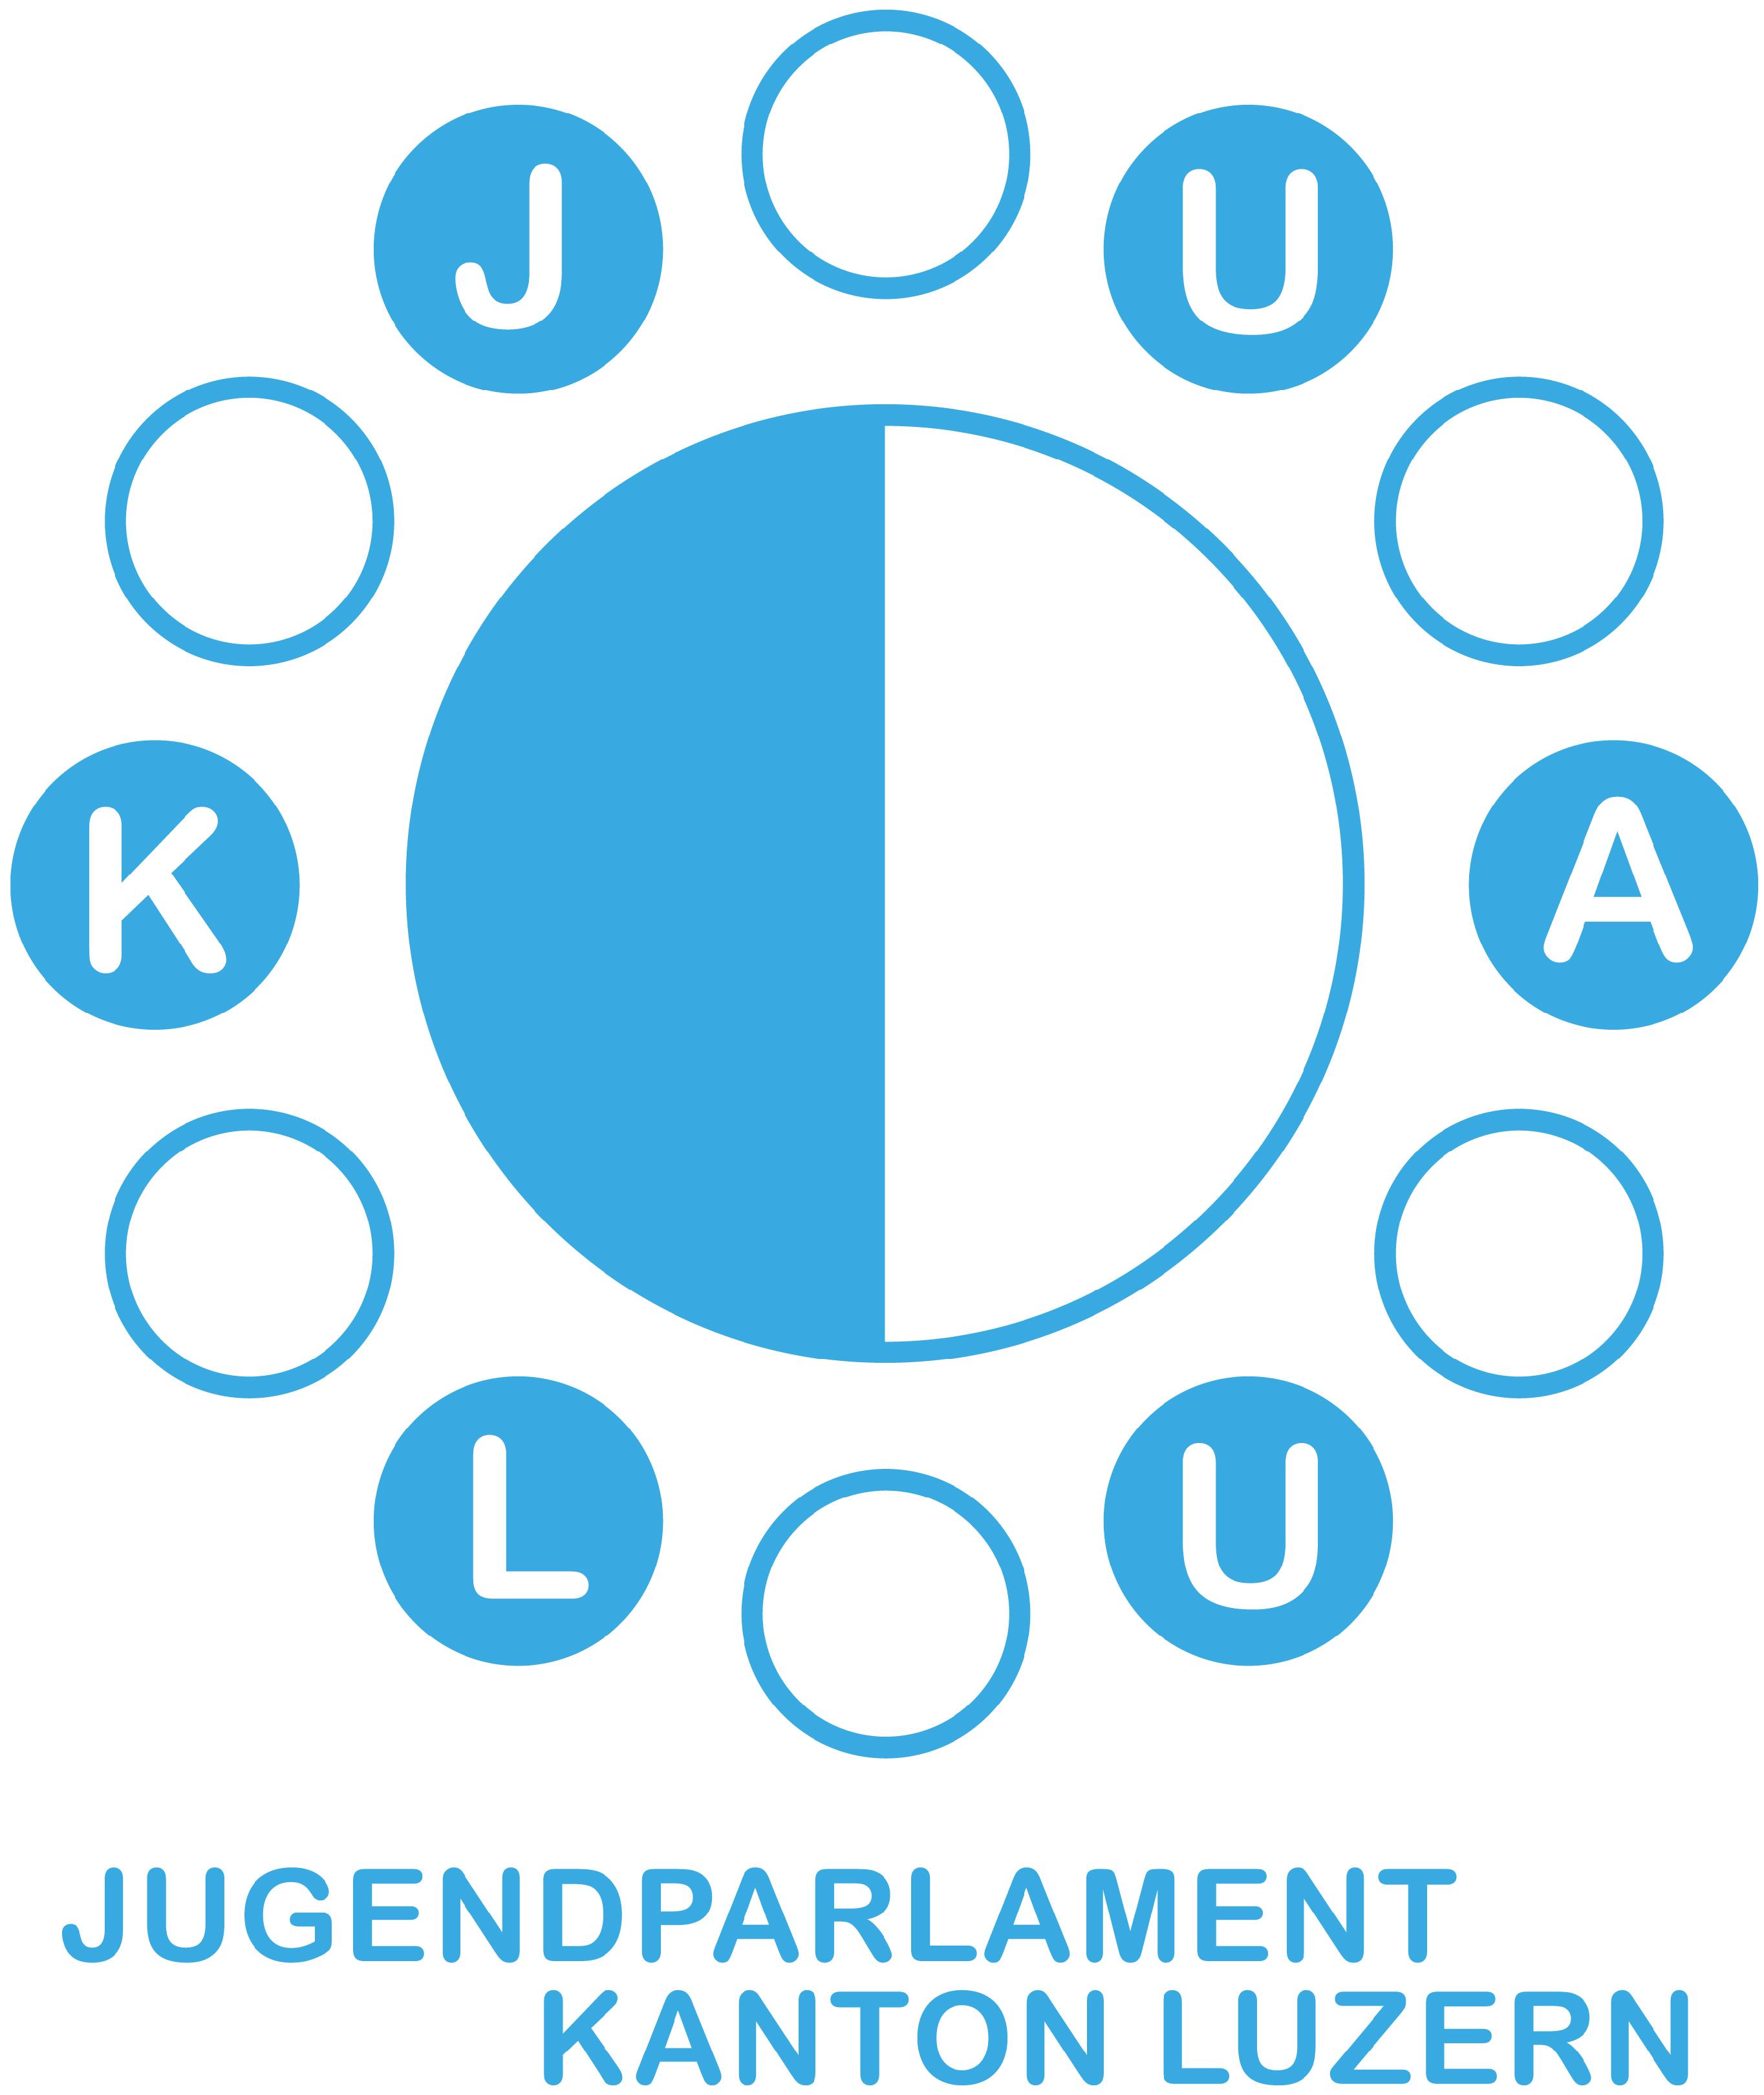 Jugendparlament Kanton Luzern